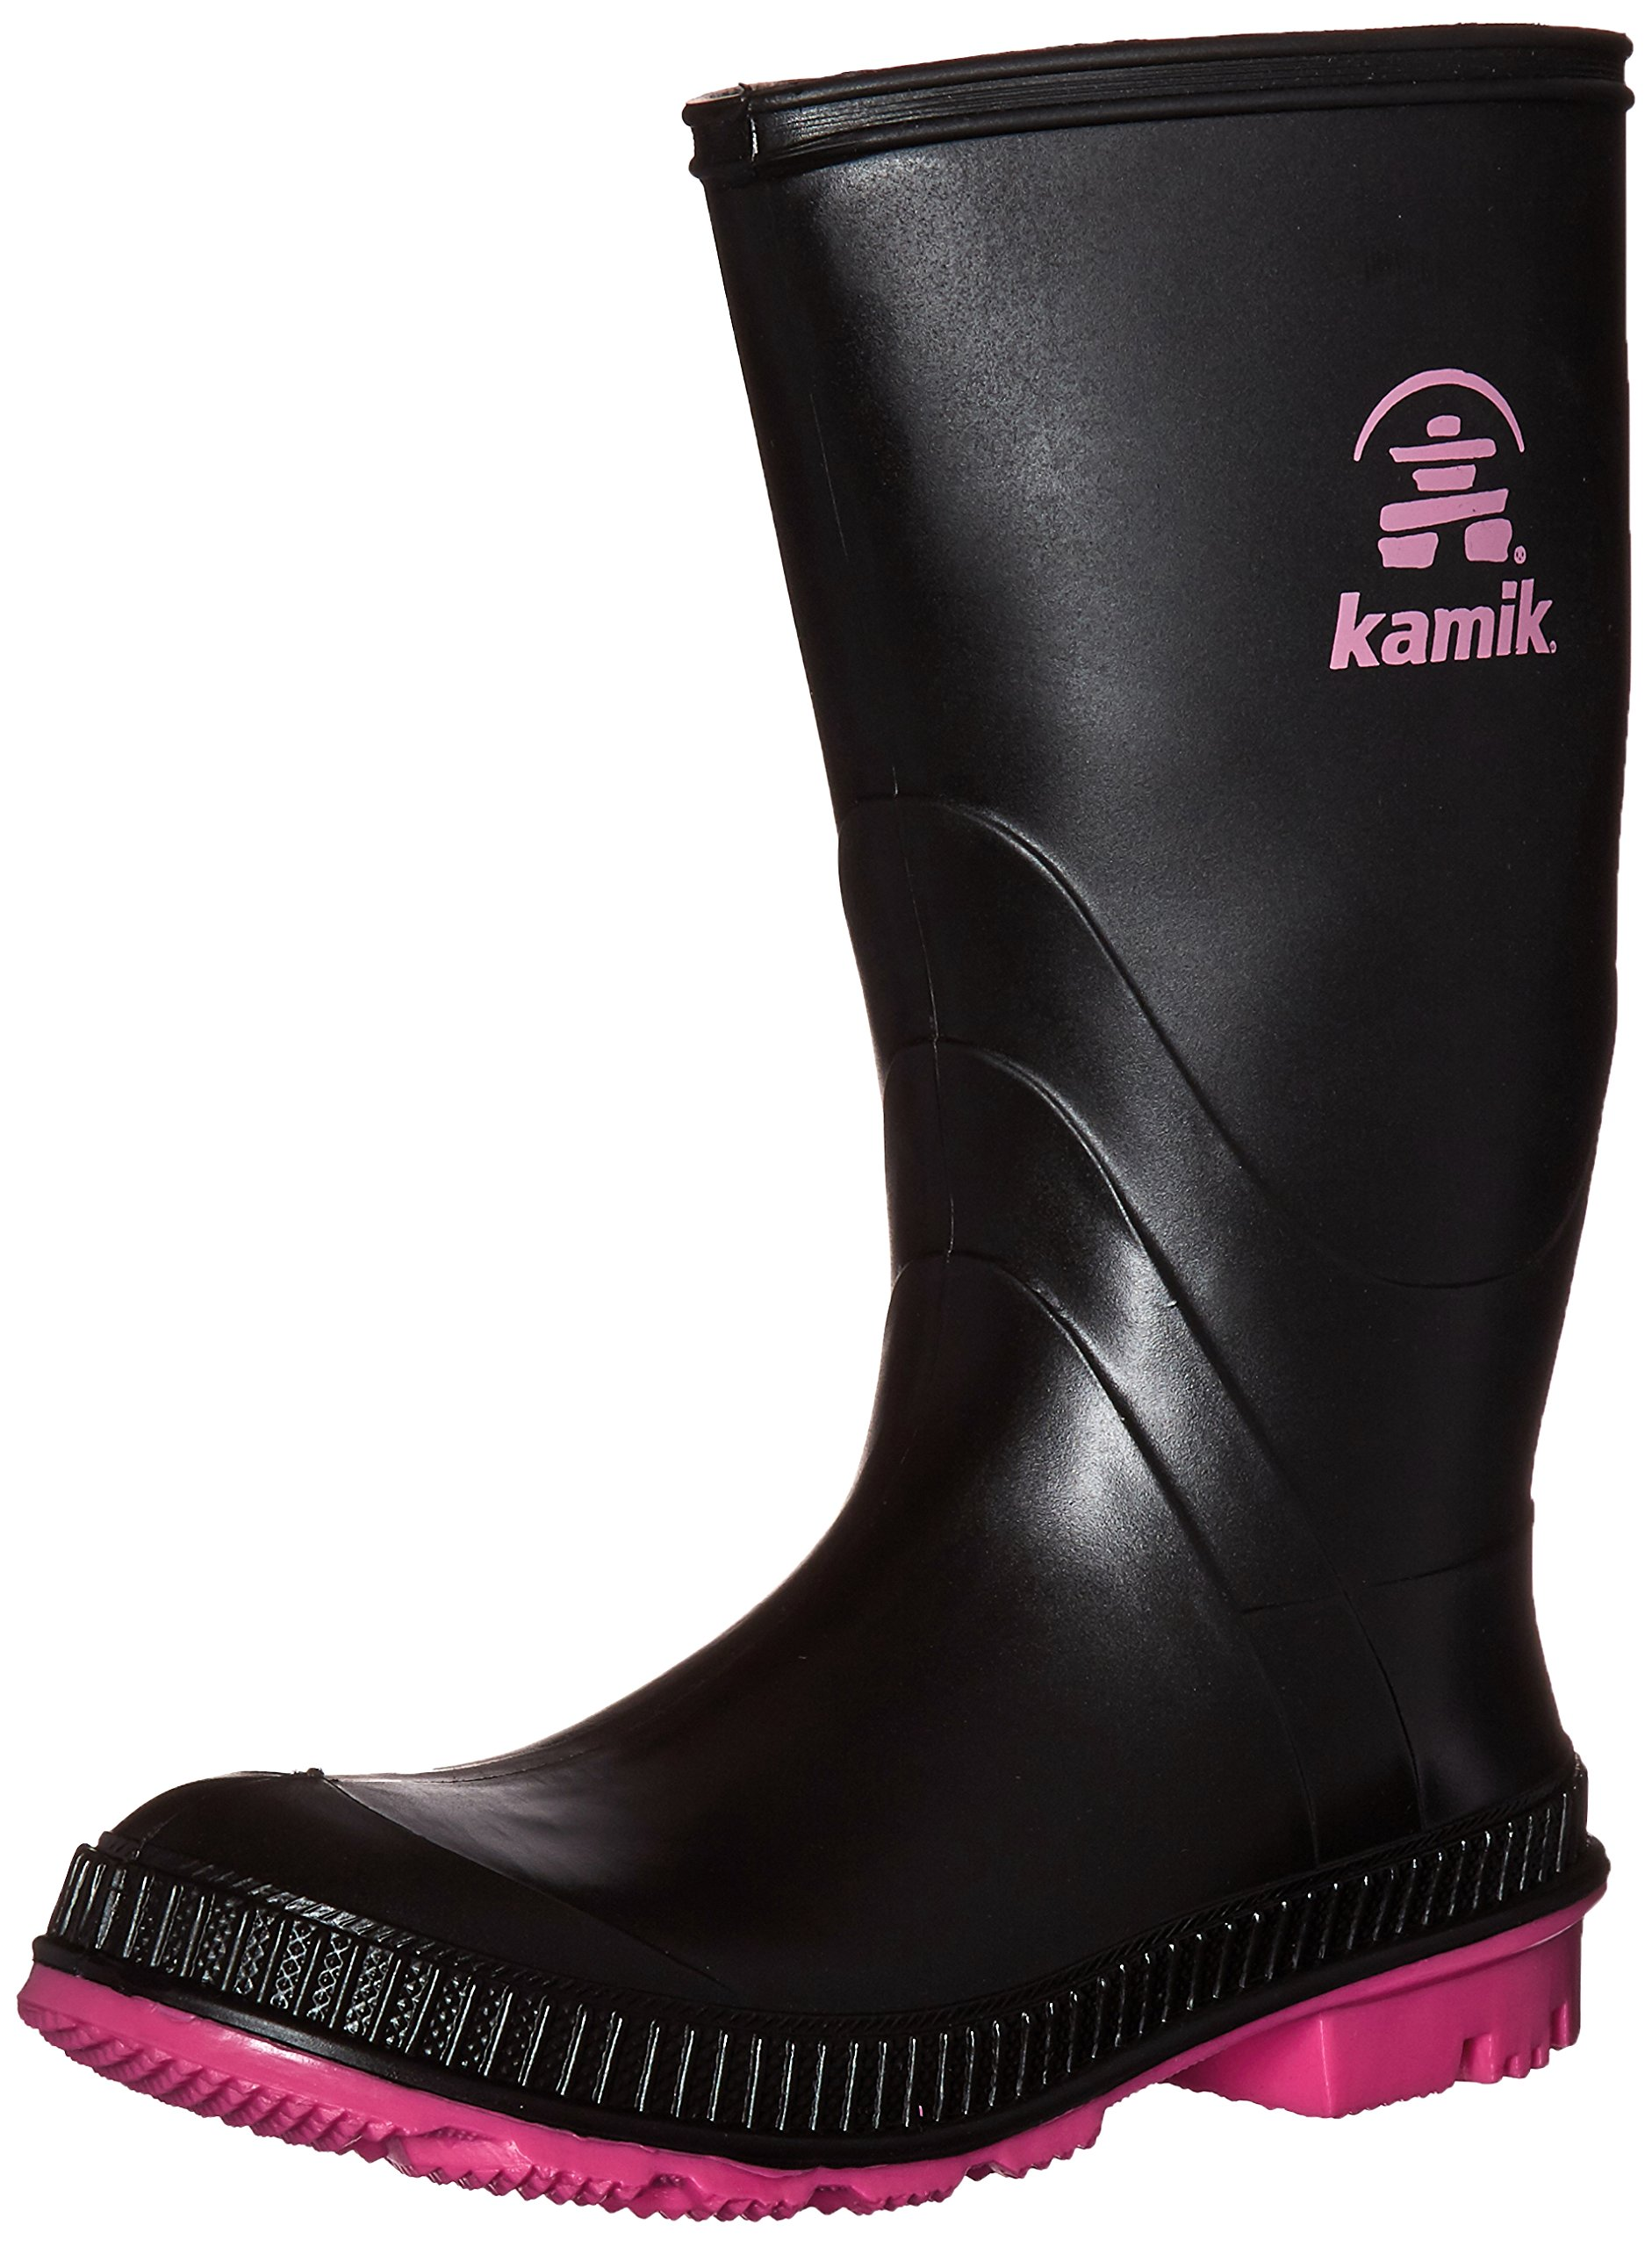 Kamik STOMP/KIDS/PUR/4149F Rain Boot Black/Magenta, 5 M US Big Kid